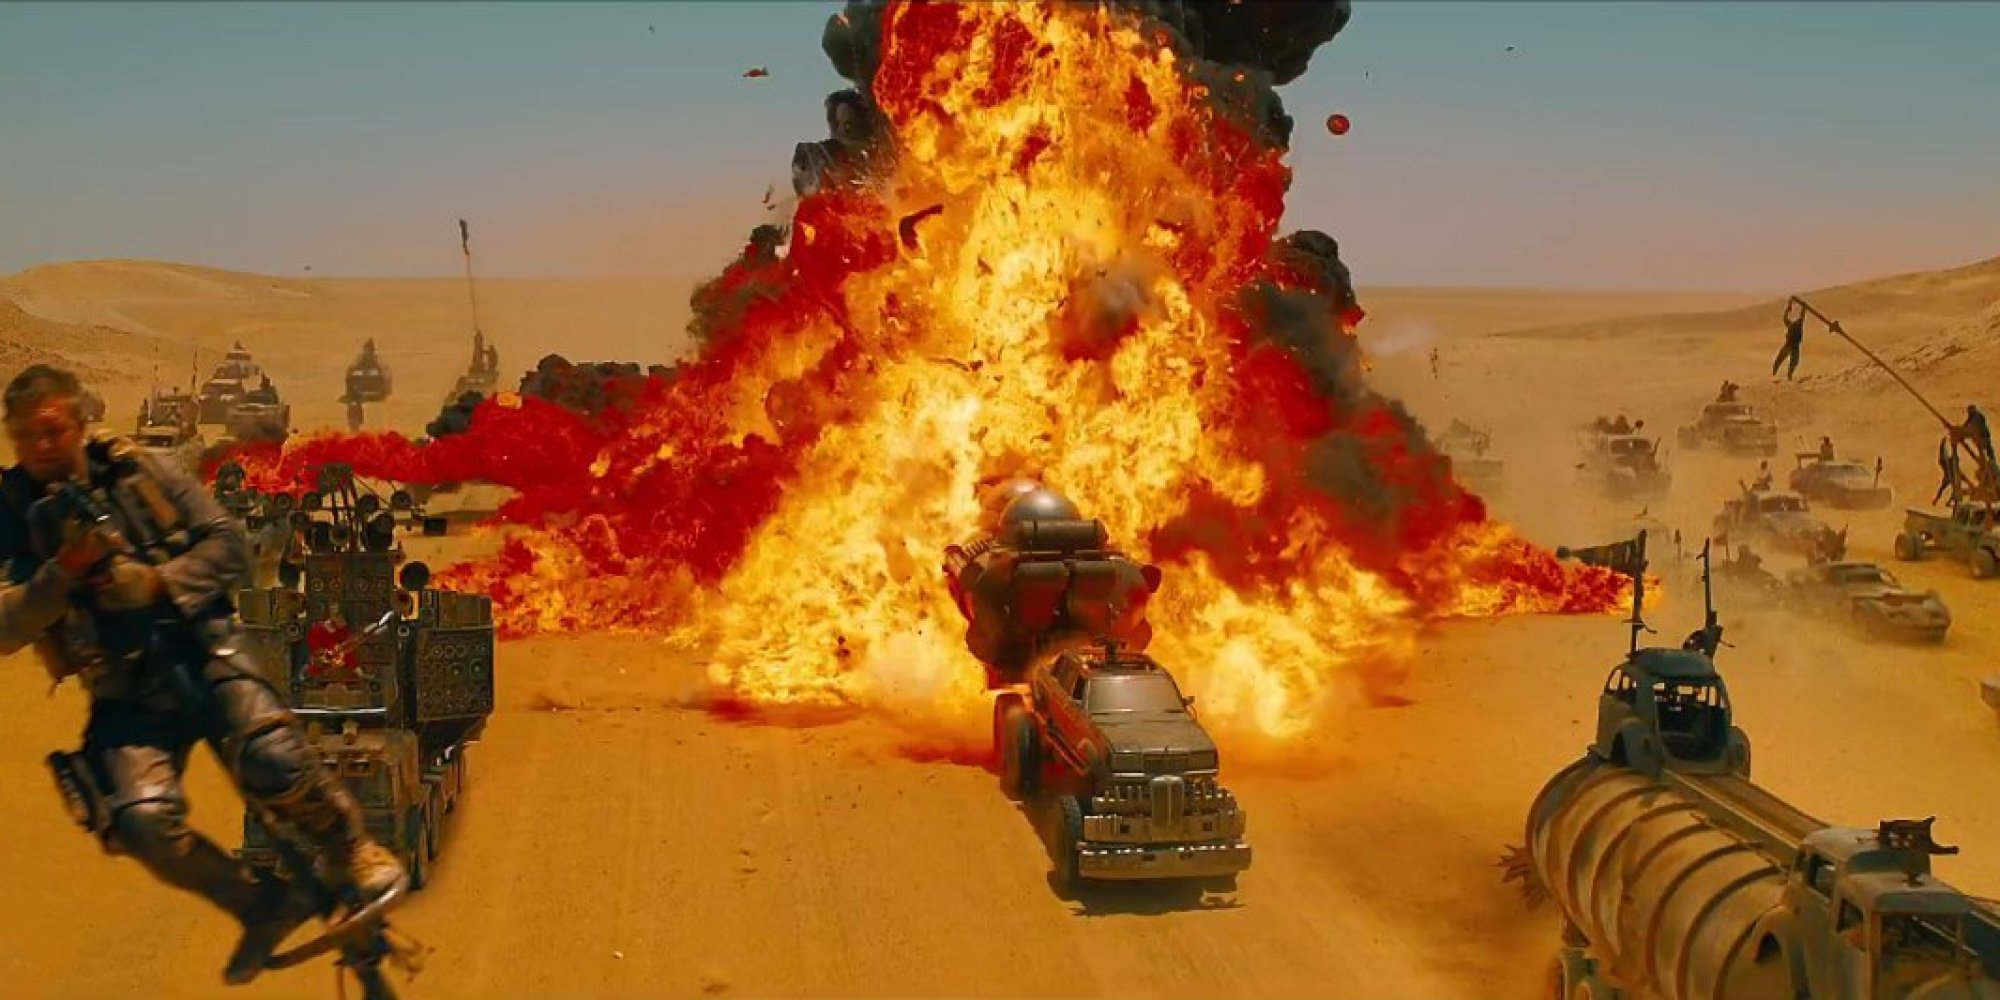 Mad Max explosion